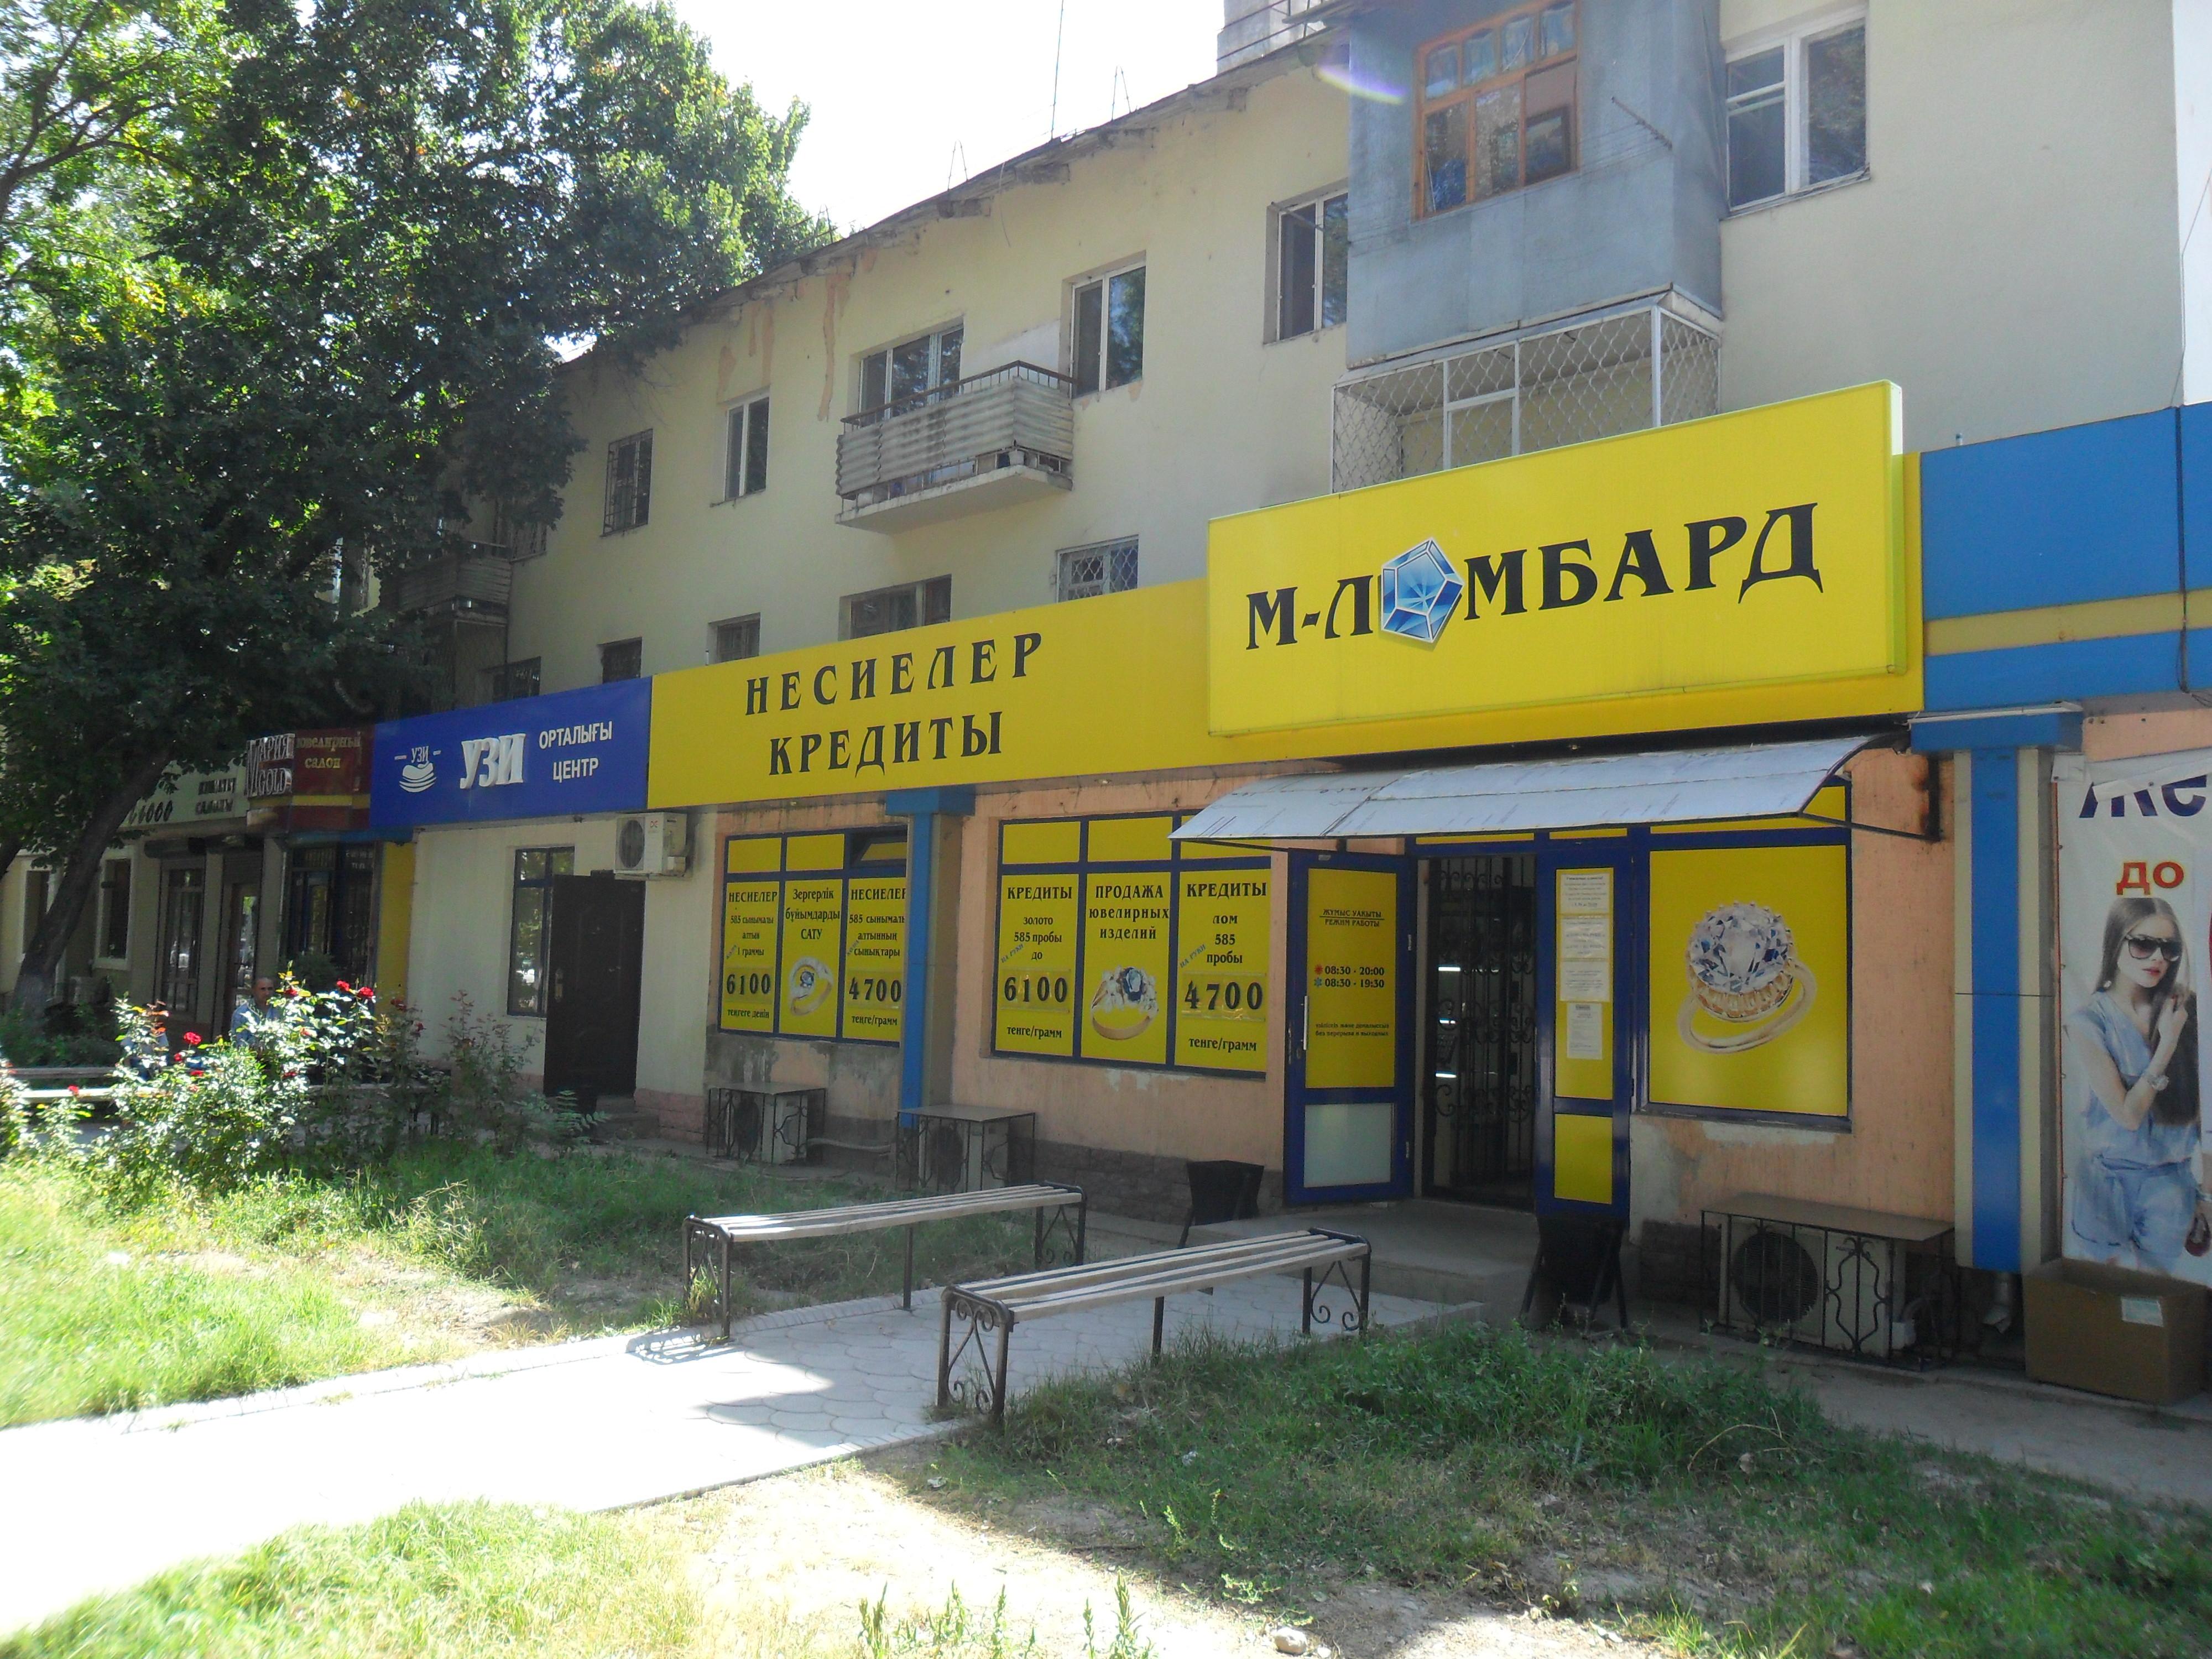 Ломбарды часто являются местами, где отмывают деньги в Казахстане. Сентябрь 2016, Тараз, Казахстан [Александр Богатик]